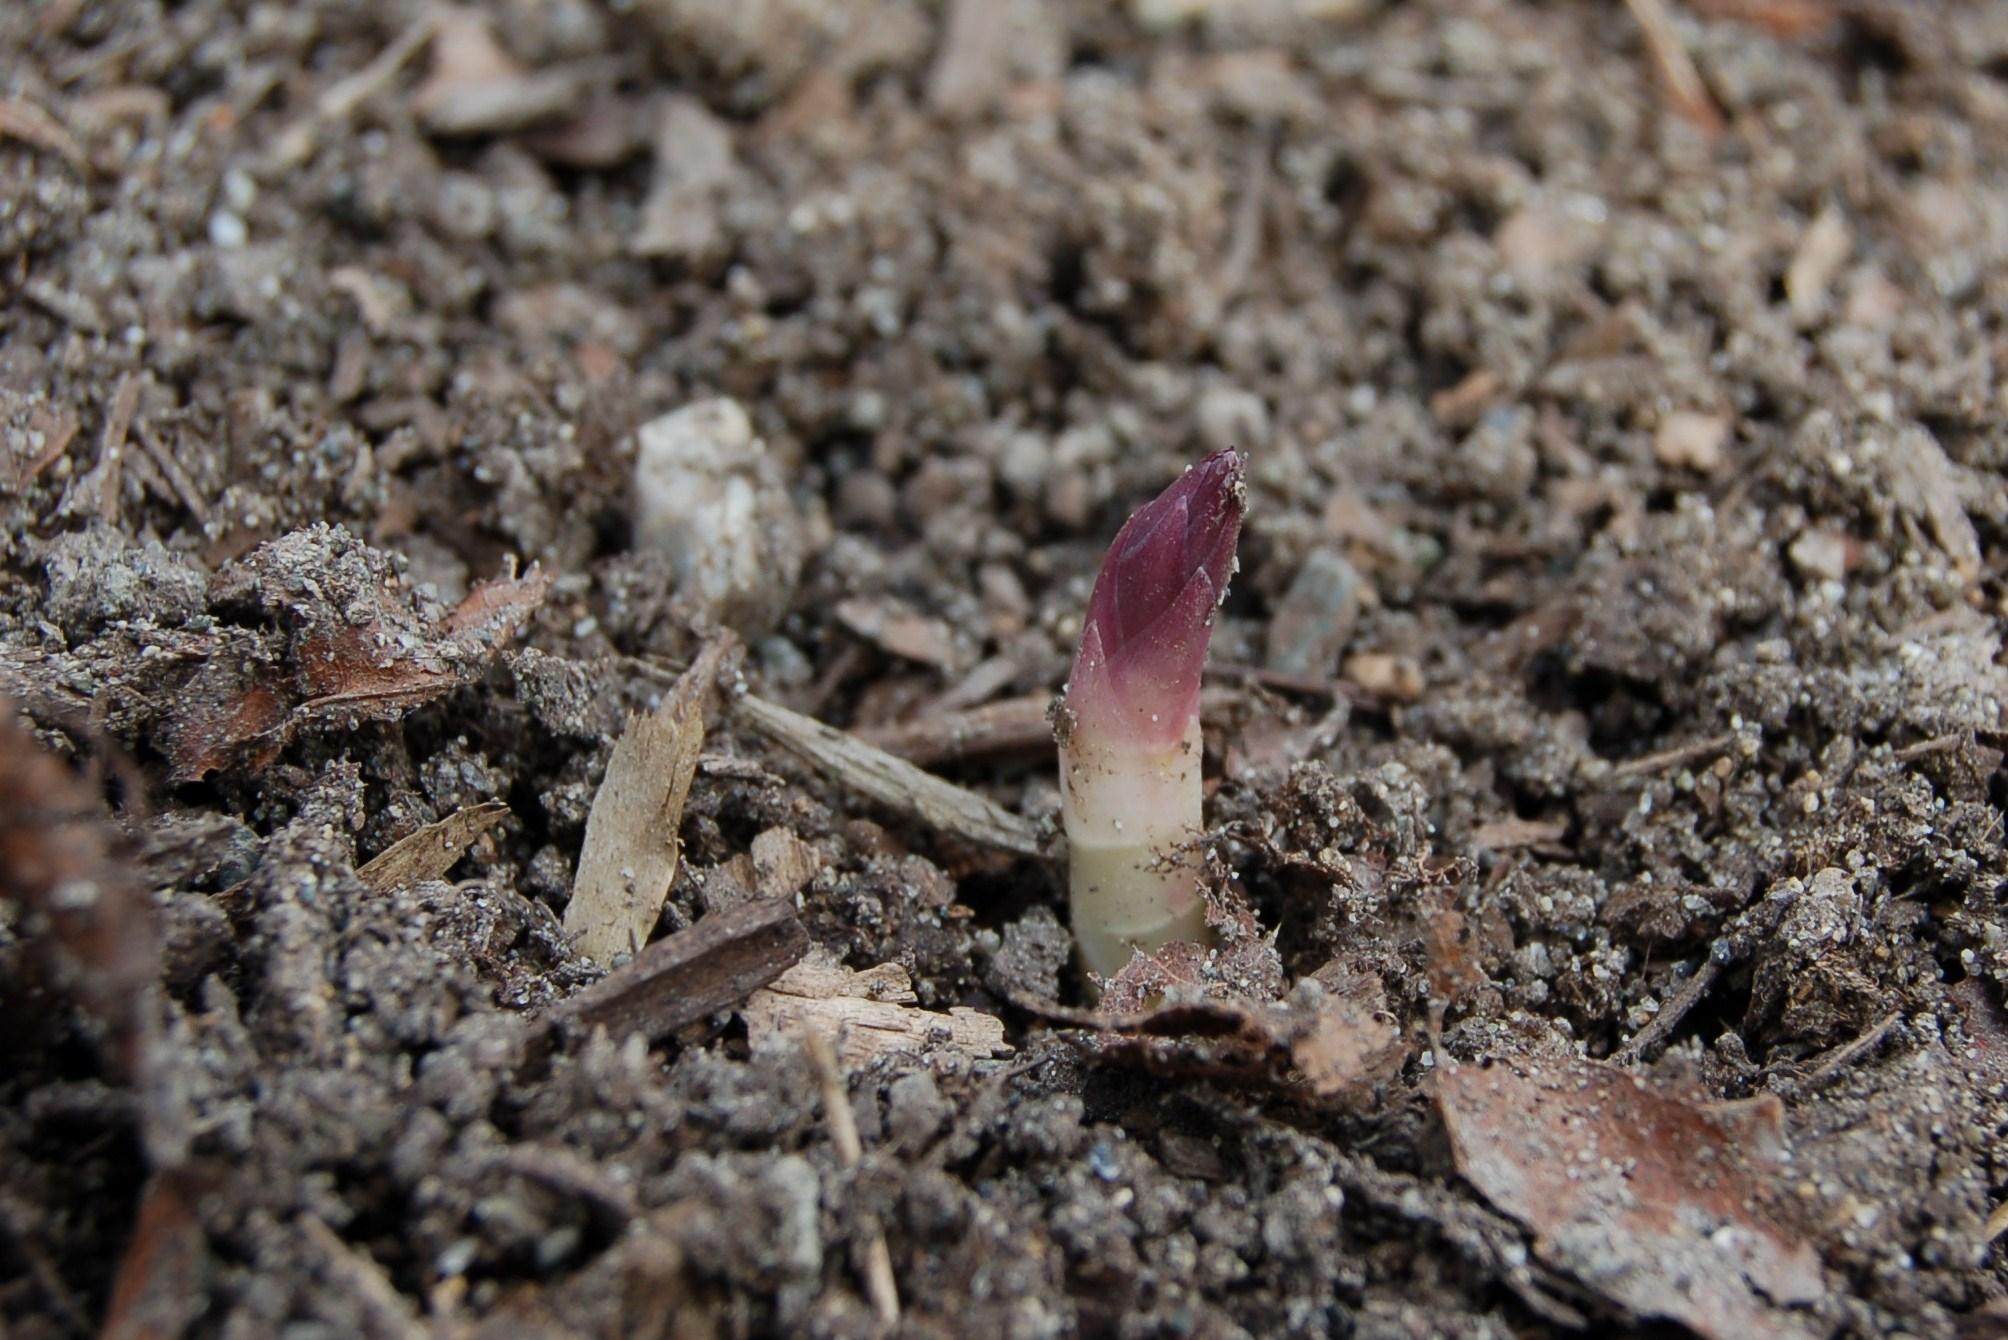 First asparagus spear